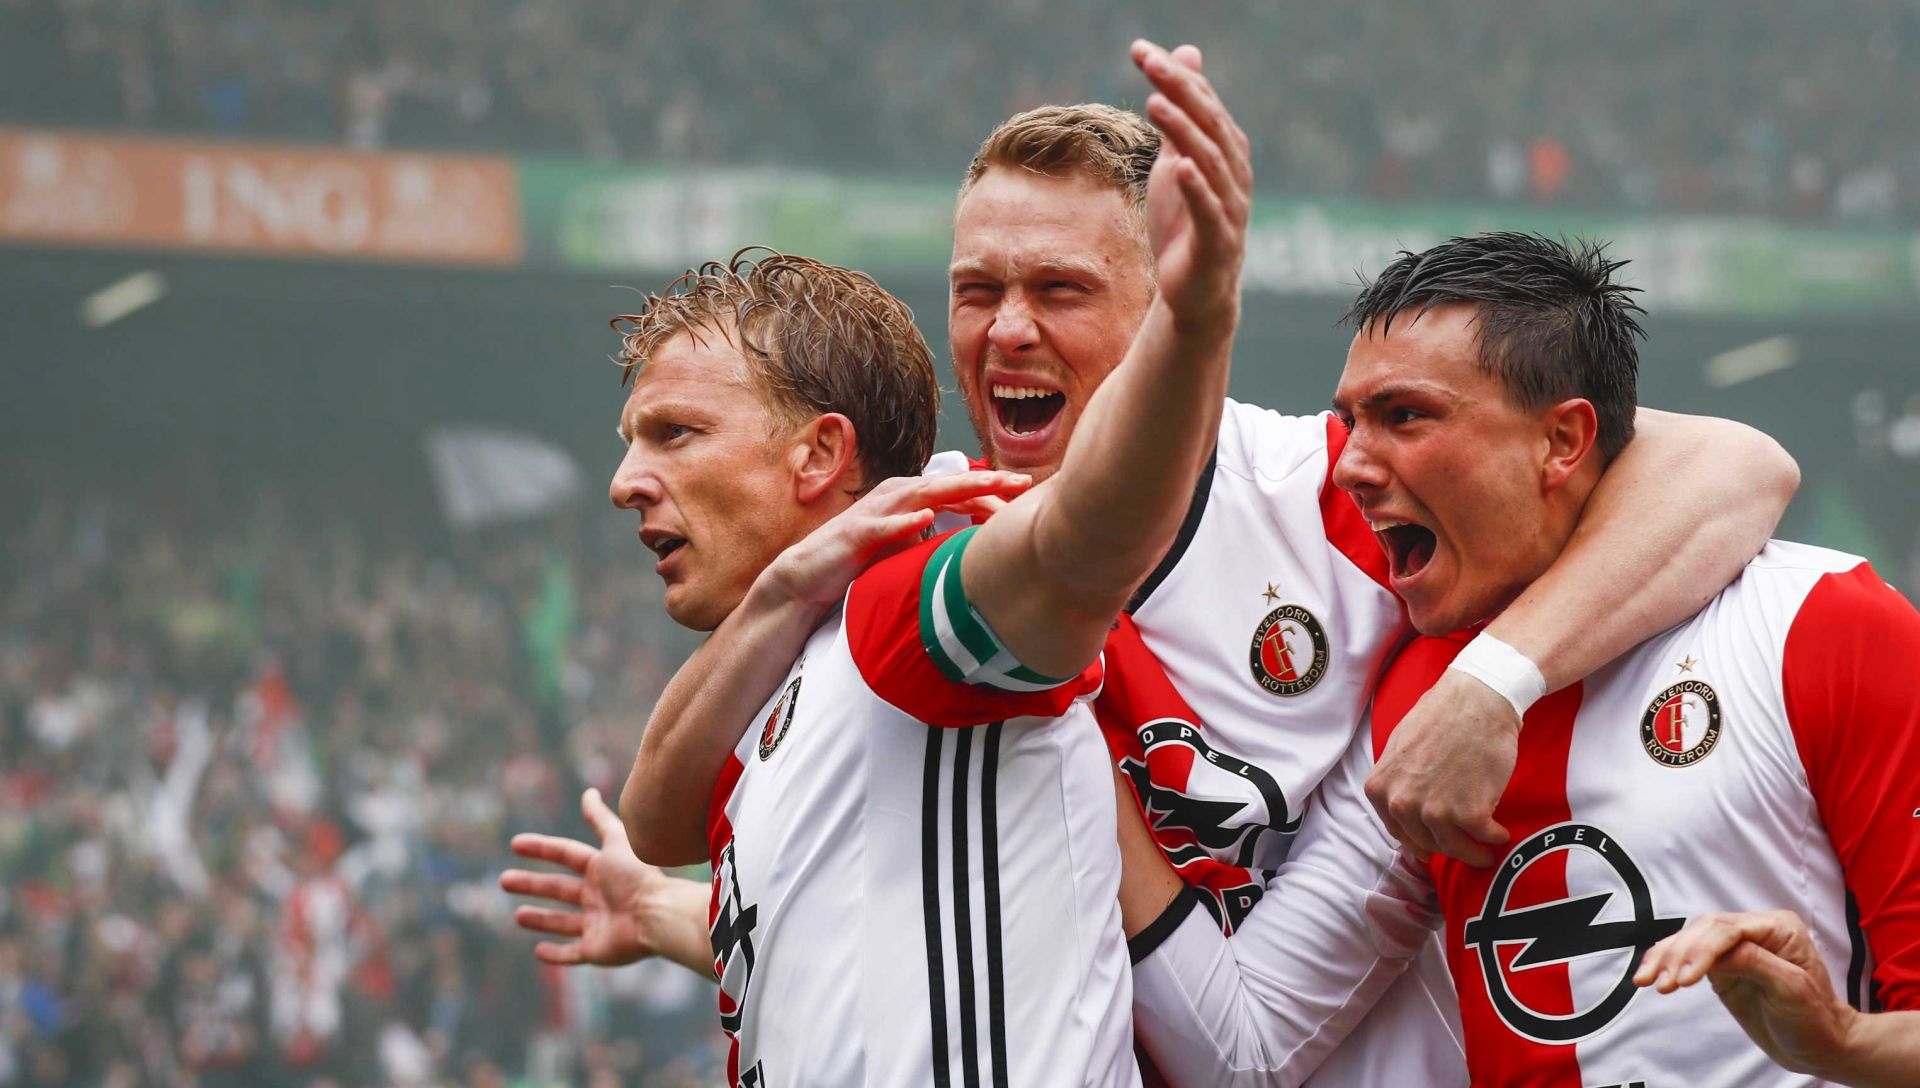 VELIKO SLAVLJE Feyenoord prvak nakon 18 godina